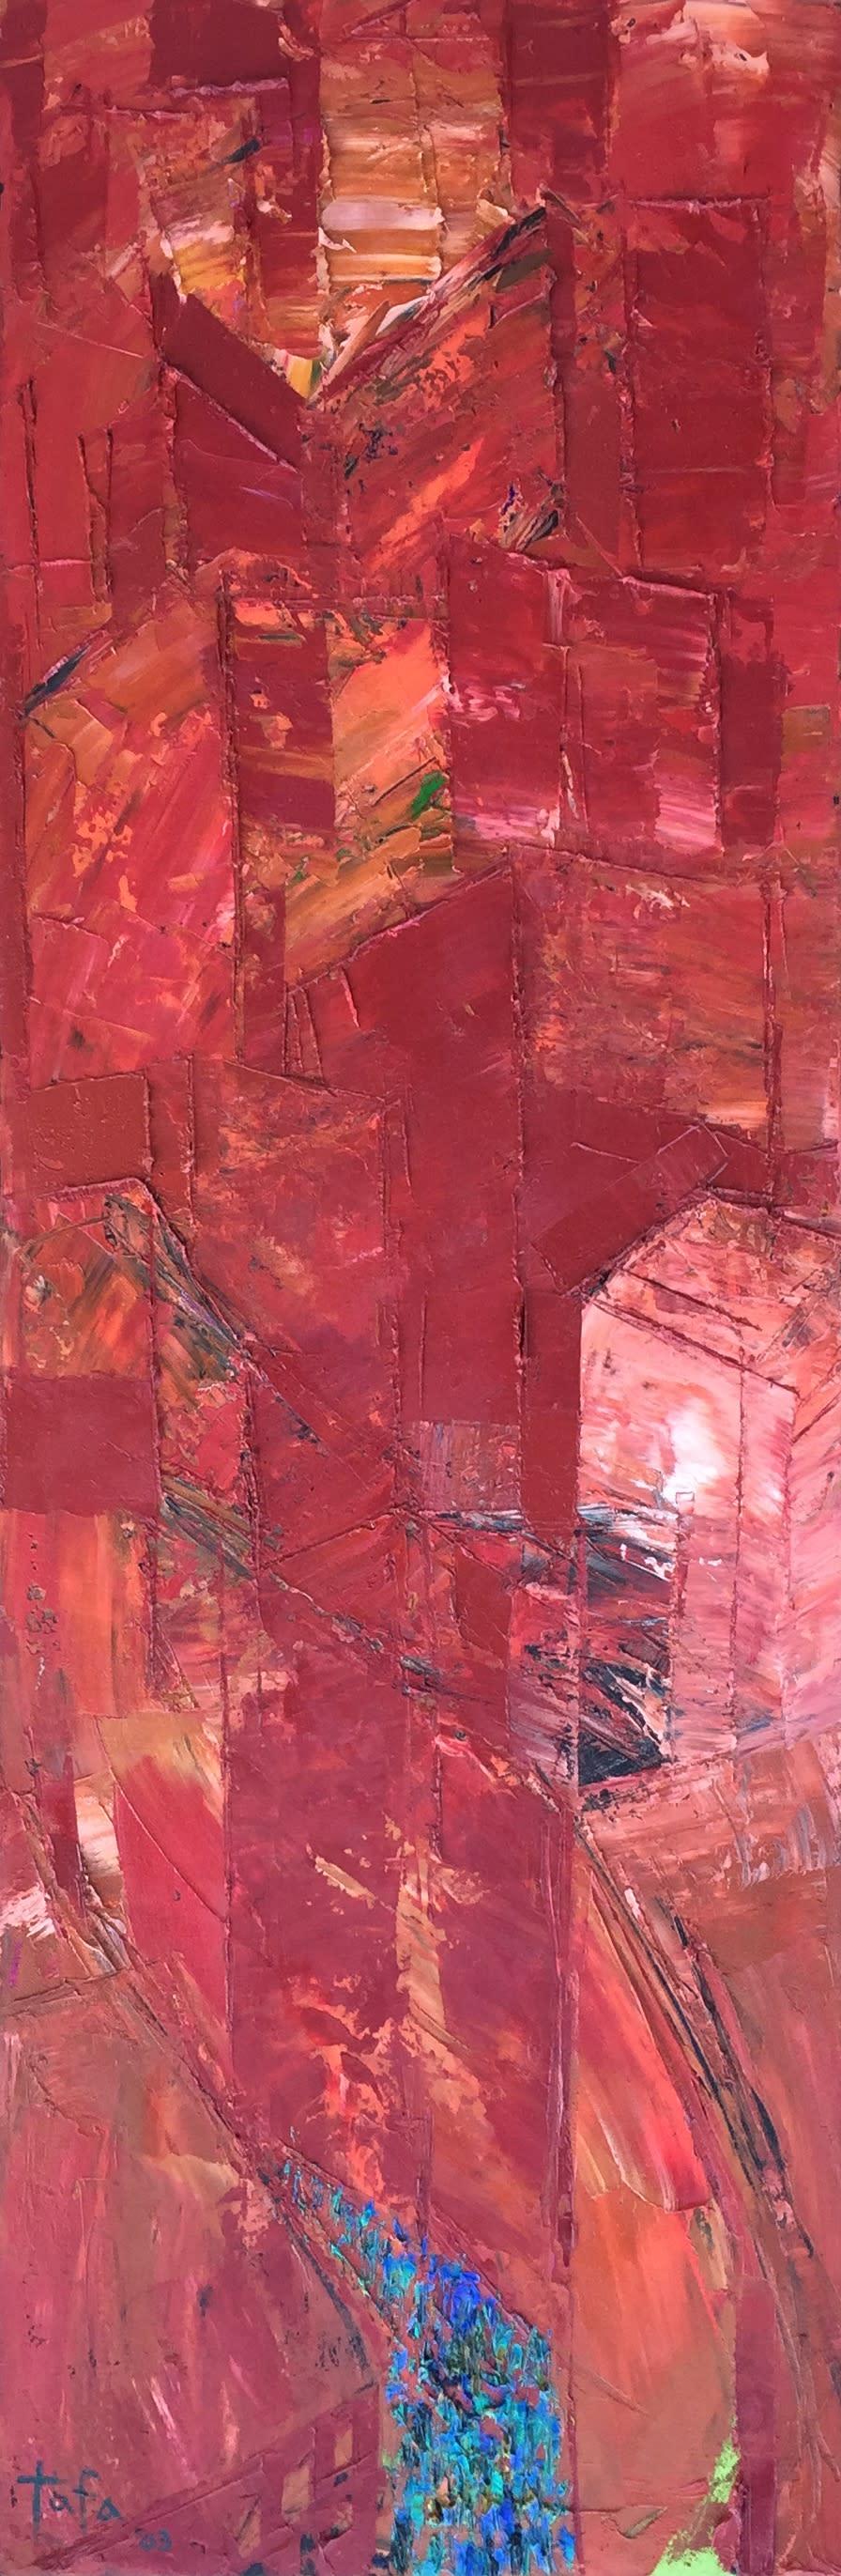 TAFA Red Jungle, 2003.0 Oil 42 x 14